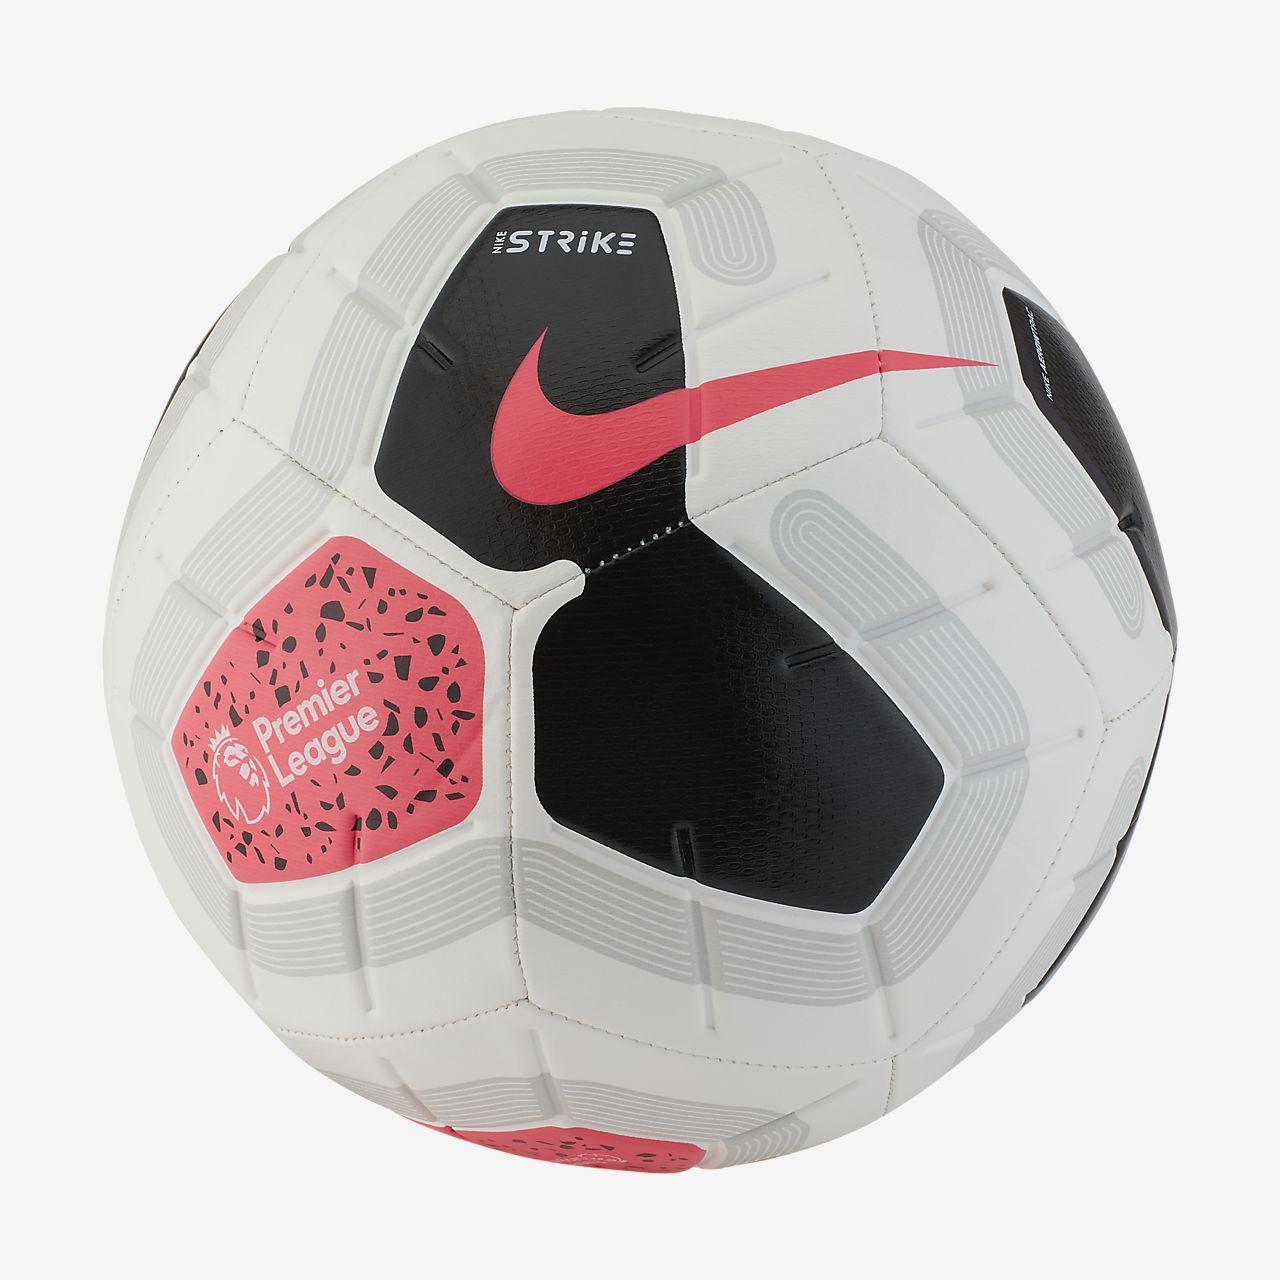 Футбольный мяч Premier League Strike